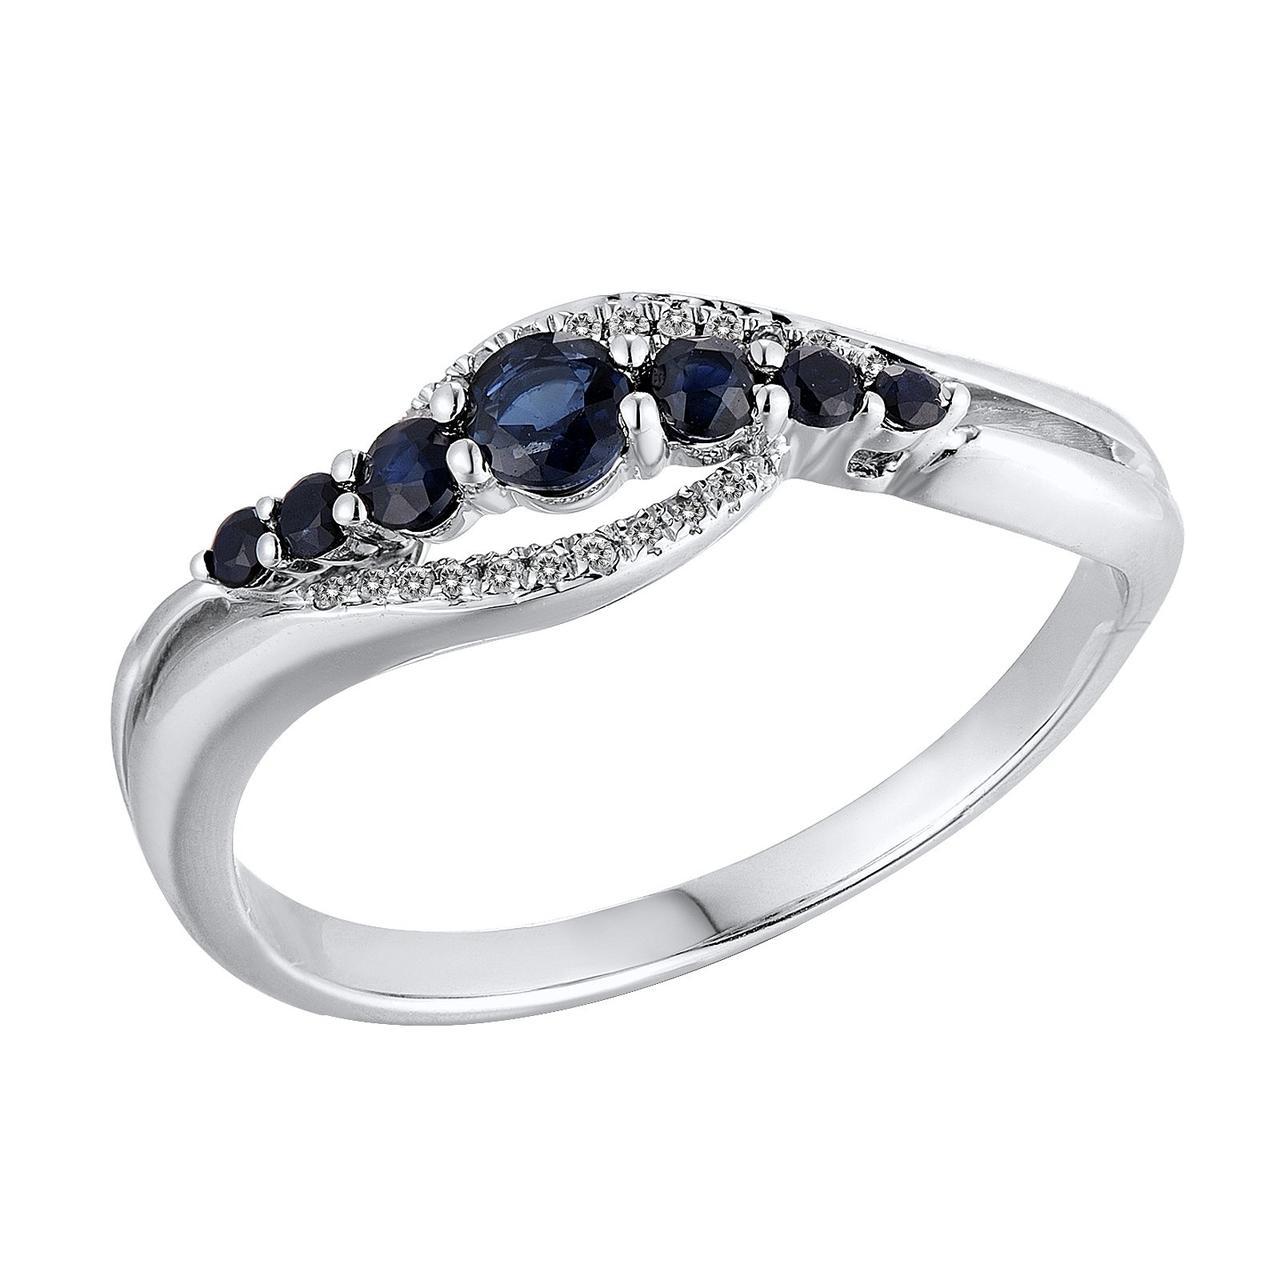 Золотое кольцо с бриллиантами и сапфирами, размер 15.5 (813690)